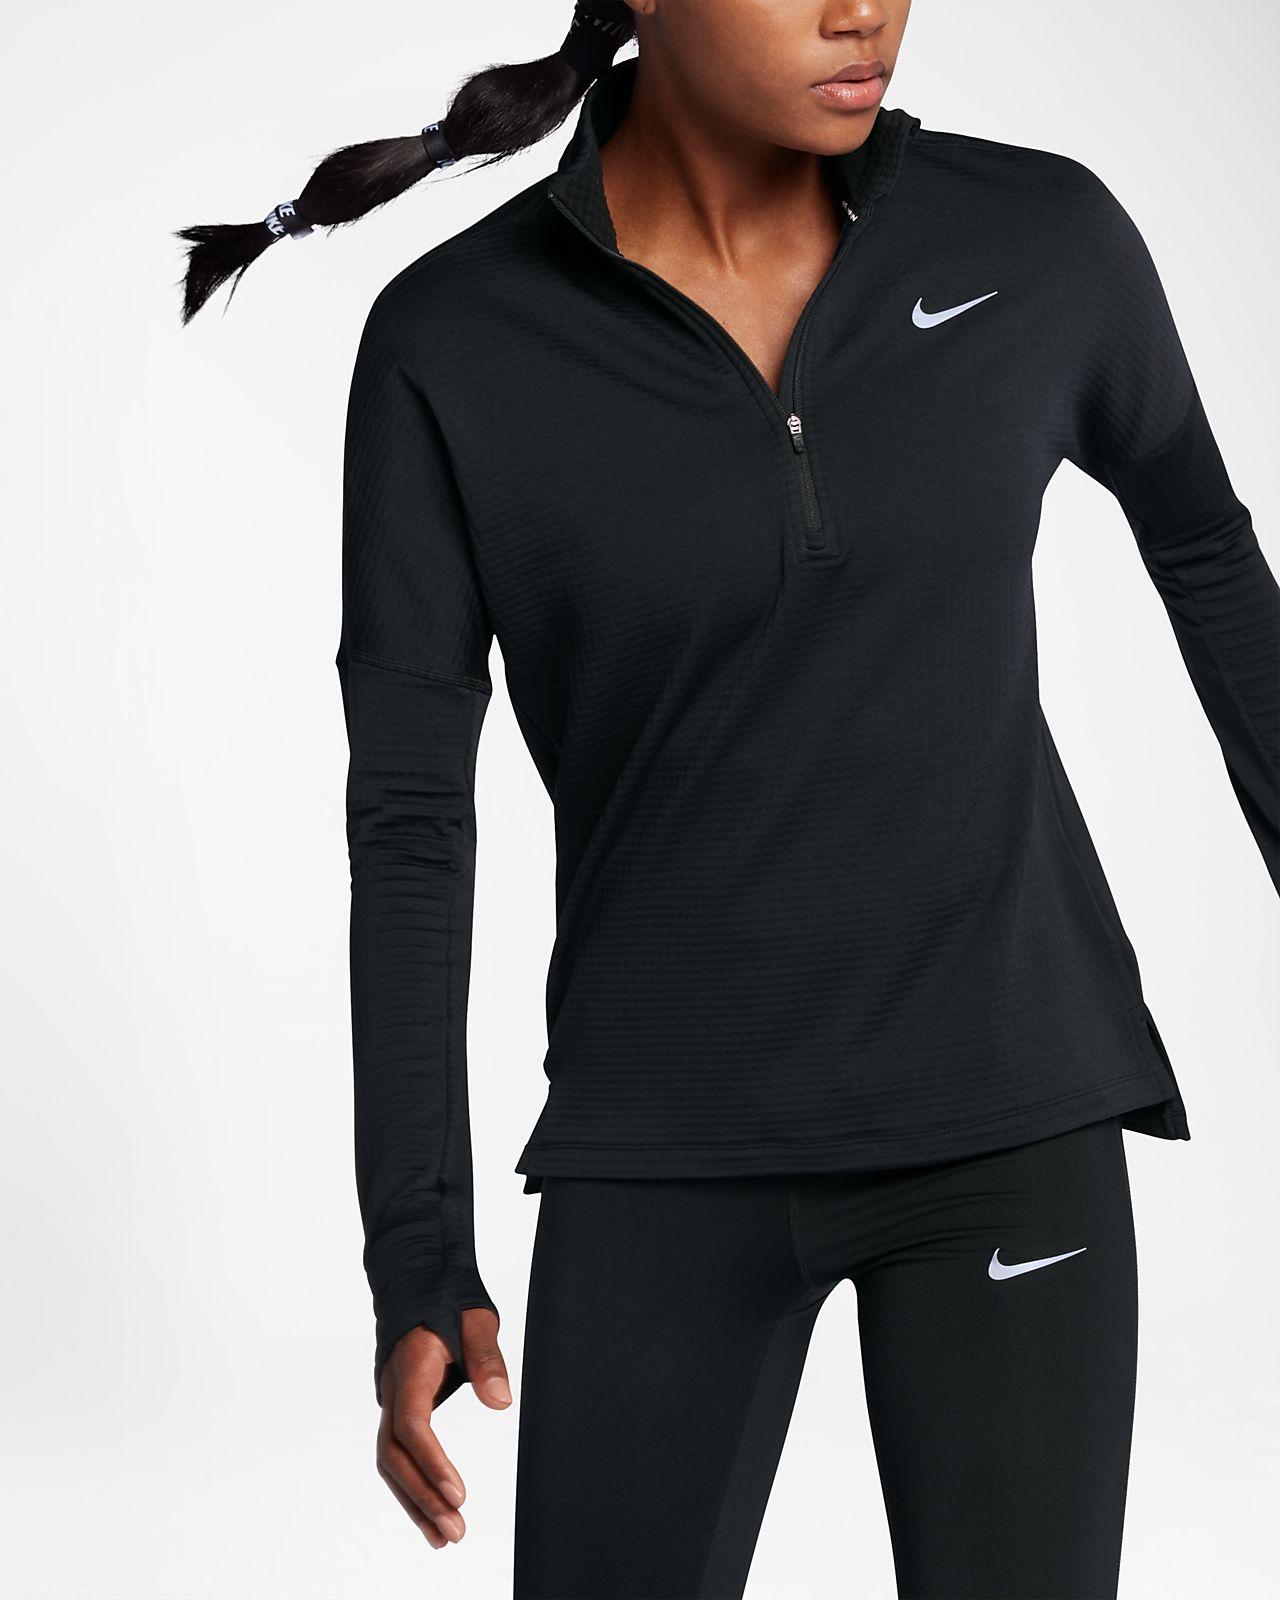 Long Sleeve Nike Shirts Womens T Shirt Design Database